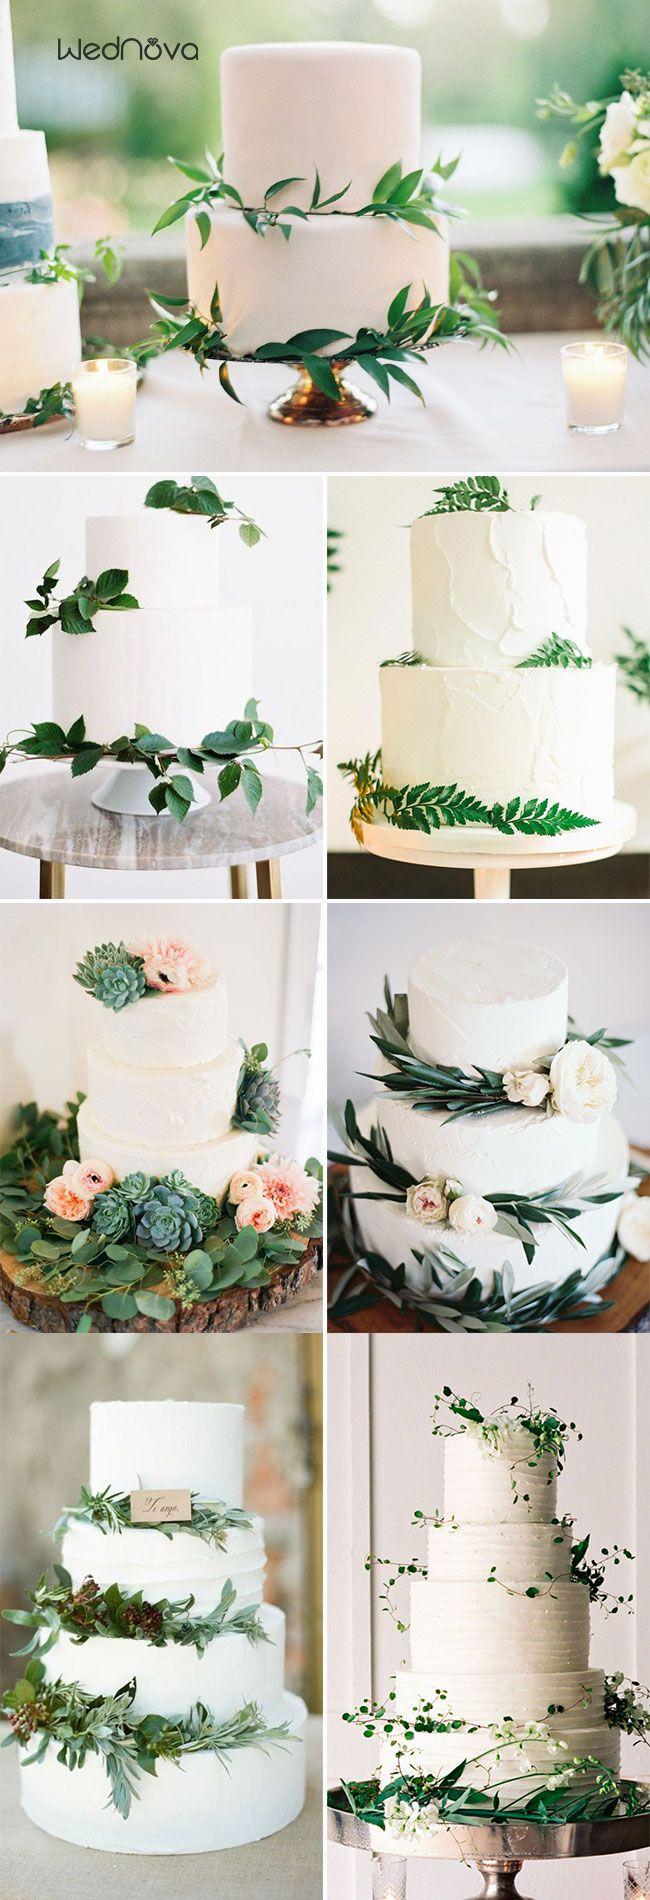 50 Greenery Wedding Ideas To Inspire Your Big Day Cool Wedding Cakes Wedding Cake Table Decorations Wedding Cake Greenery